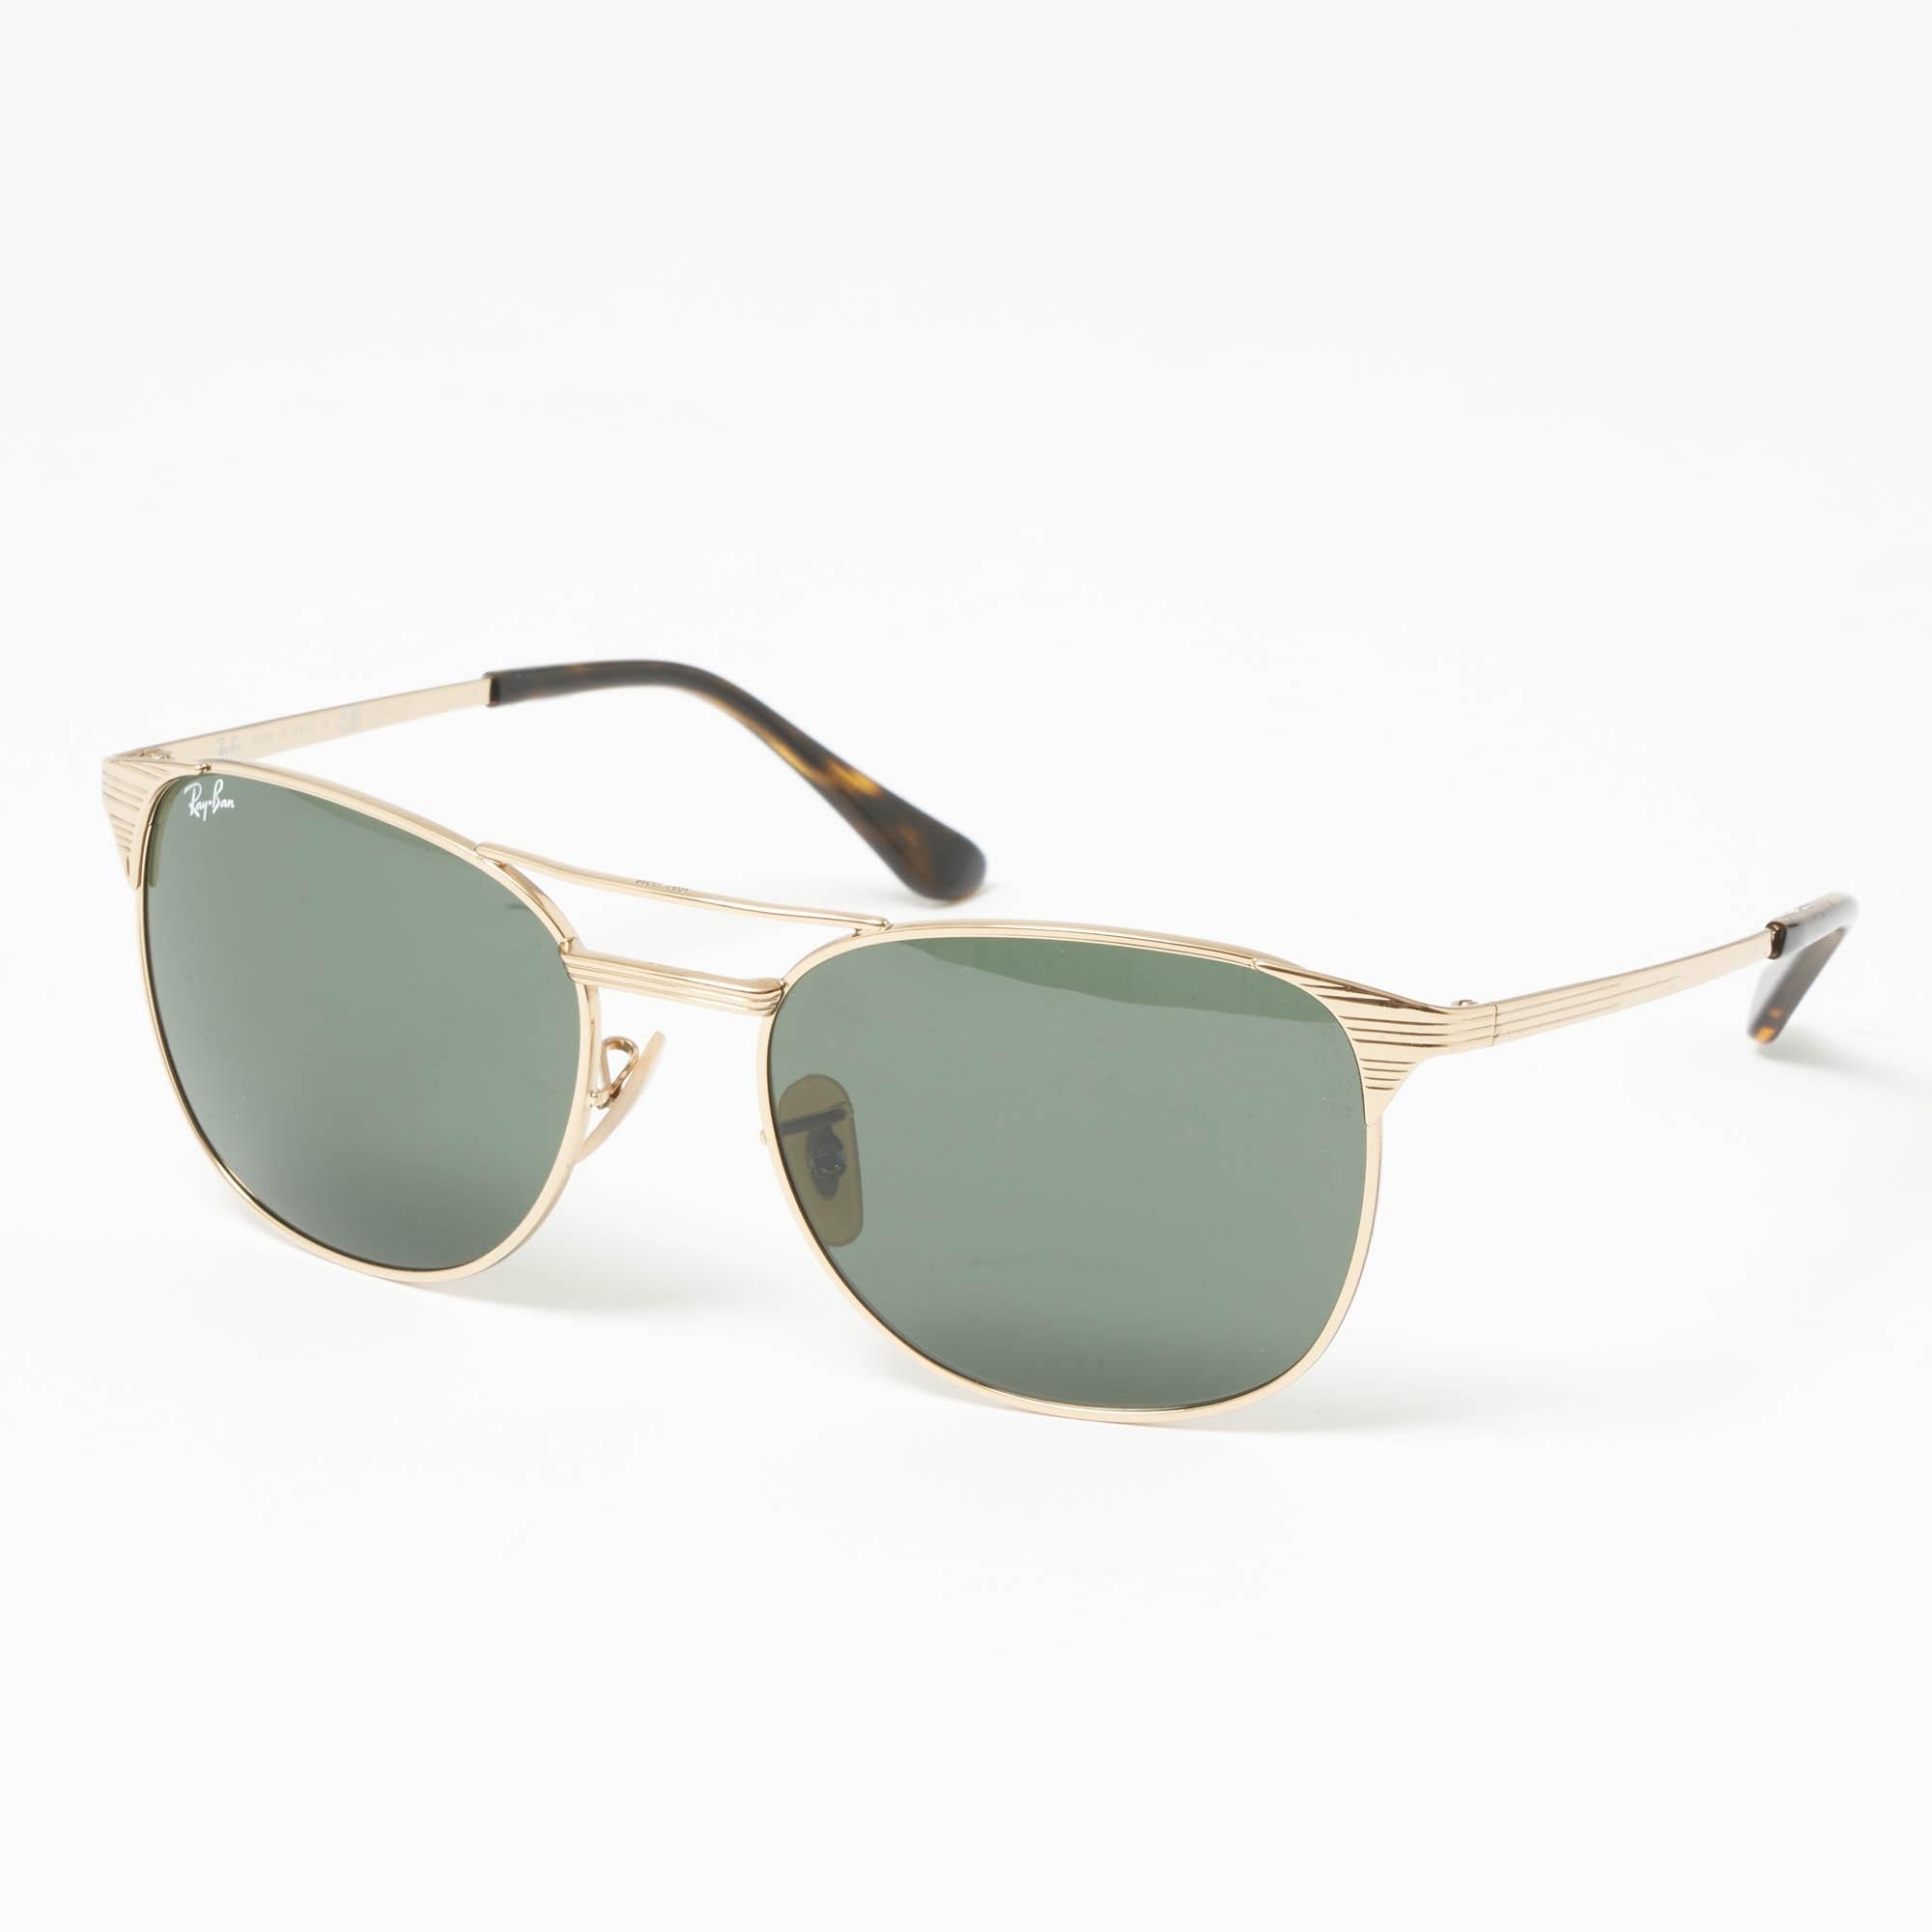 724707f527 Gold Signet Sunglasses - Green Classic G-15 Lenses